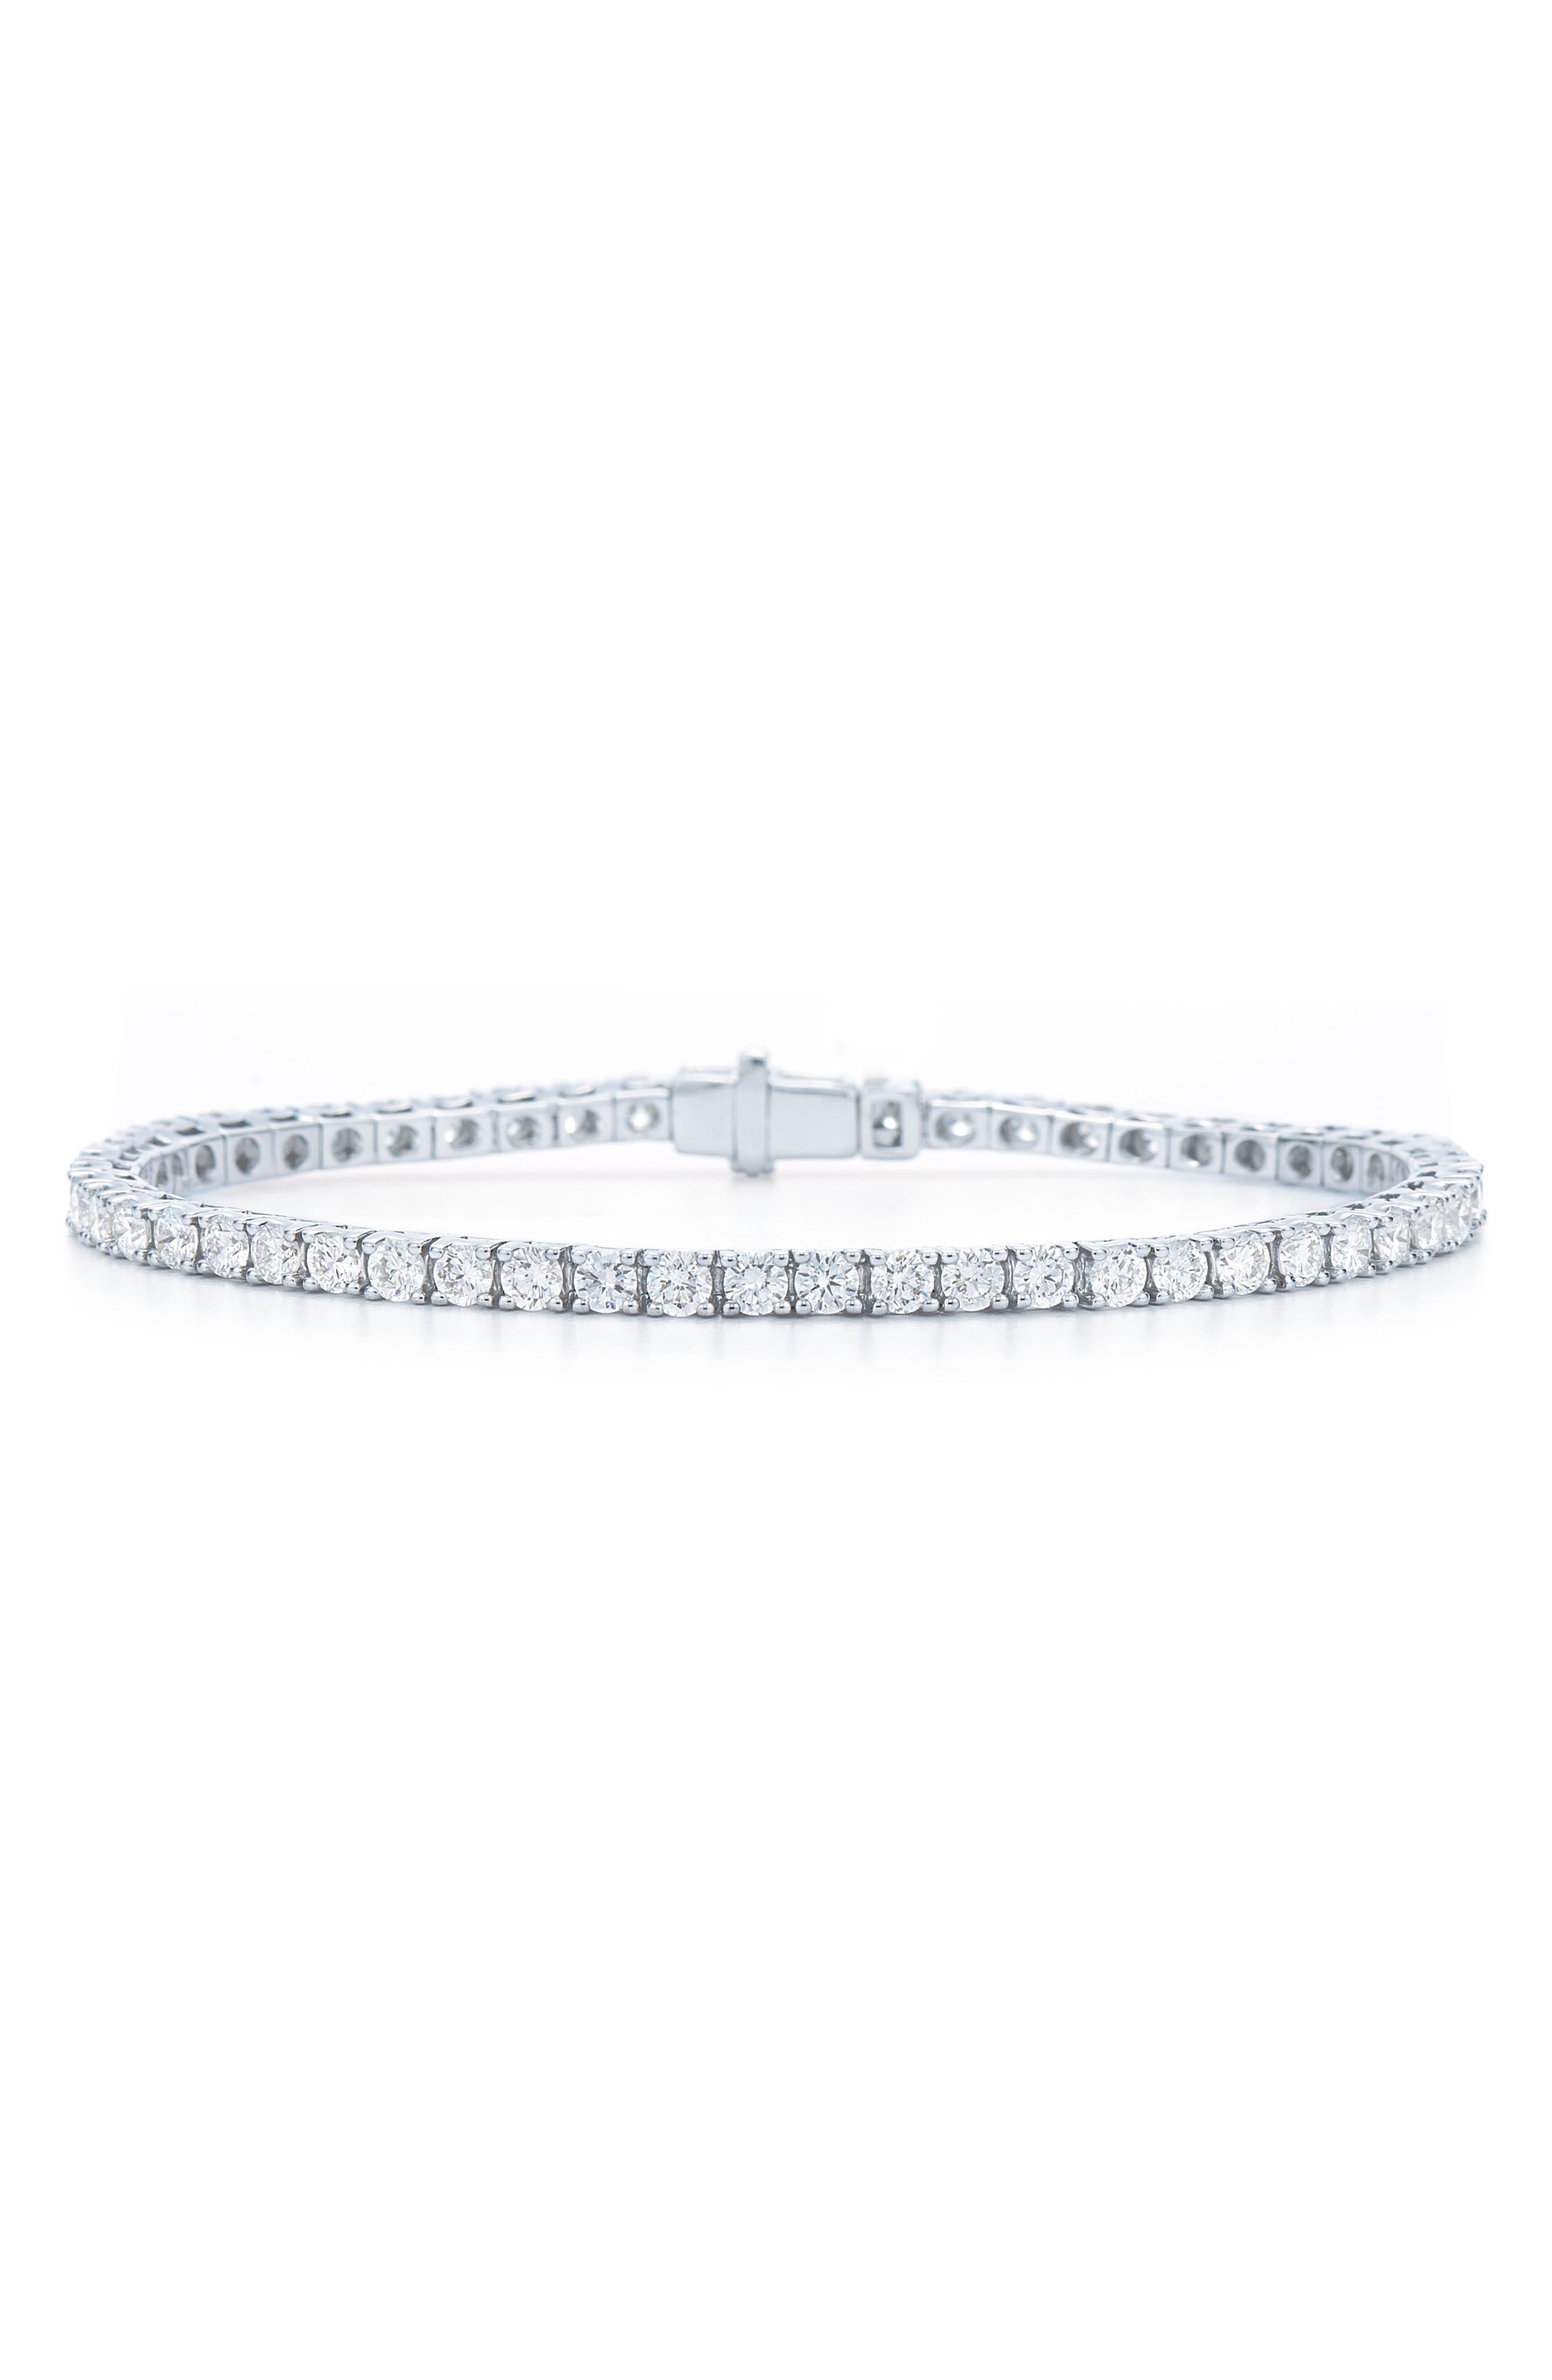 Riviera Diamond Line Bracelet,                         Main,                         color, 711